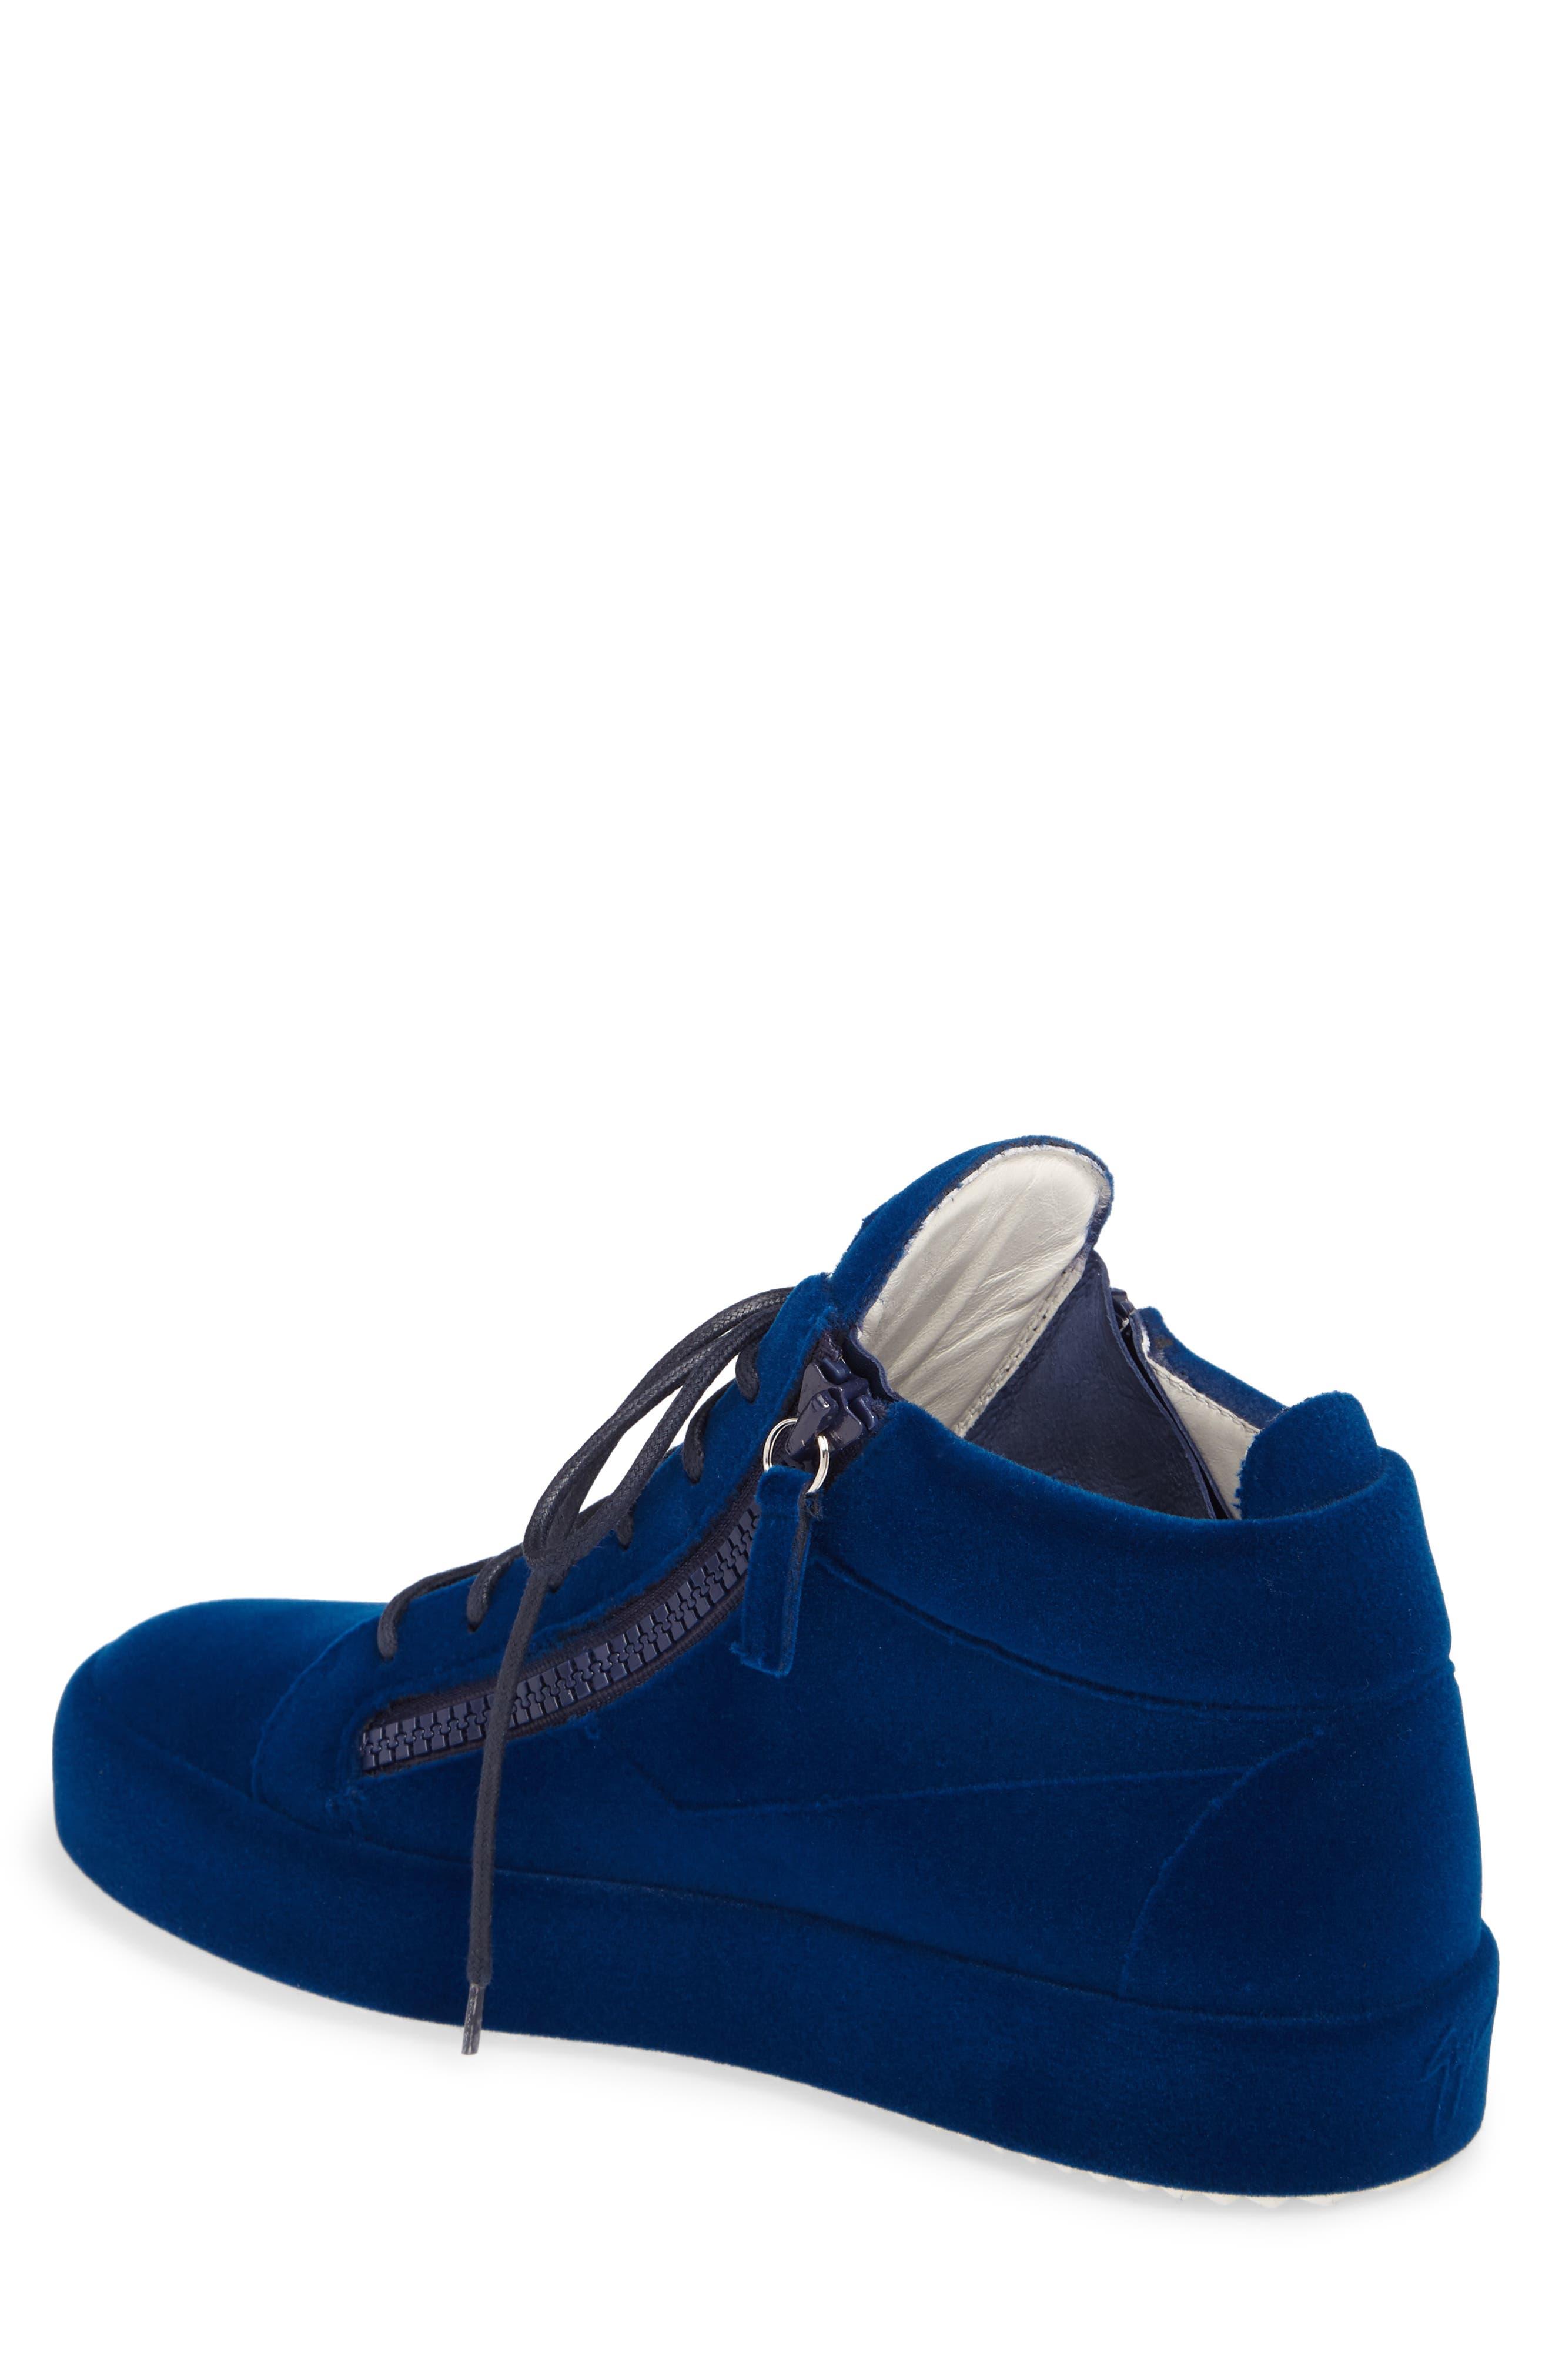 Mid Top Sneaker,                             Alternate thumbnail 2, color,                             469